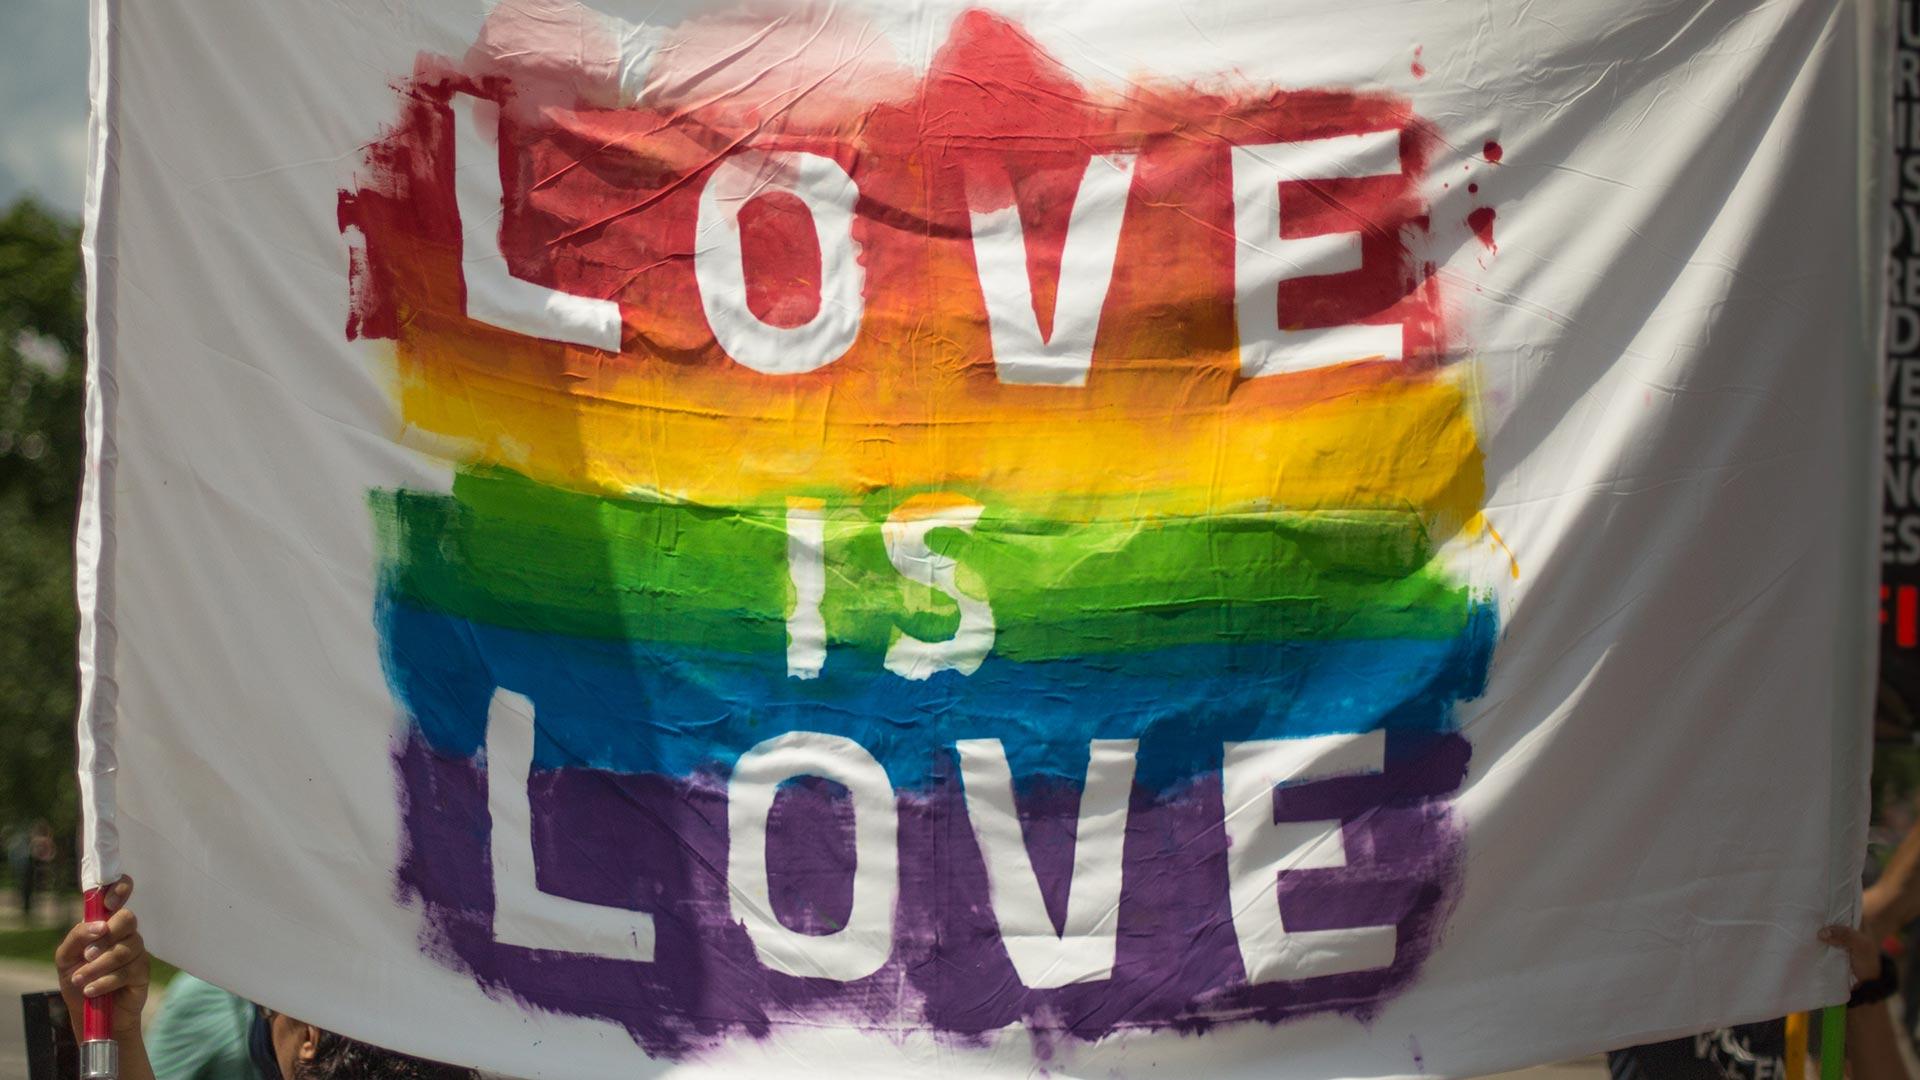 Back to basics: Sexual orientation discrimination